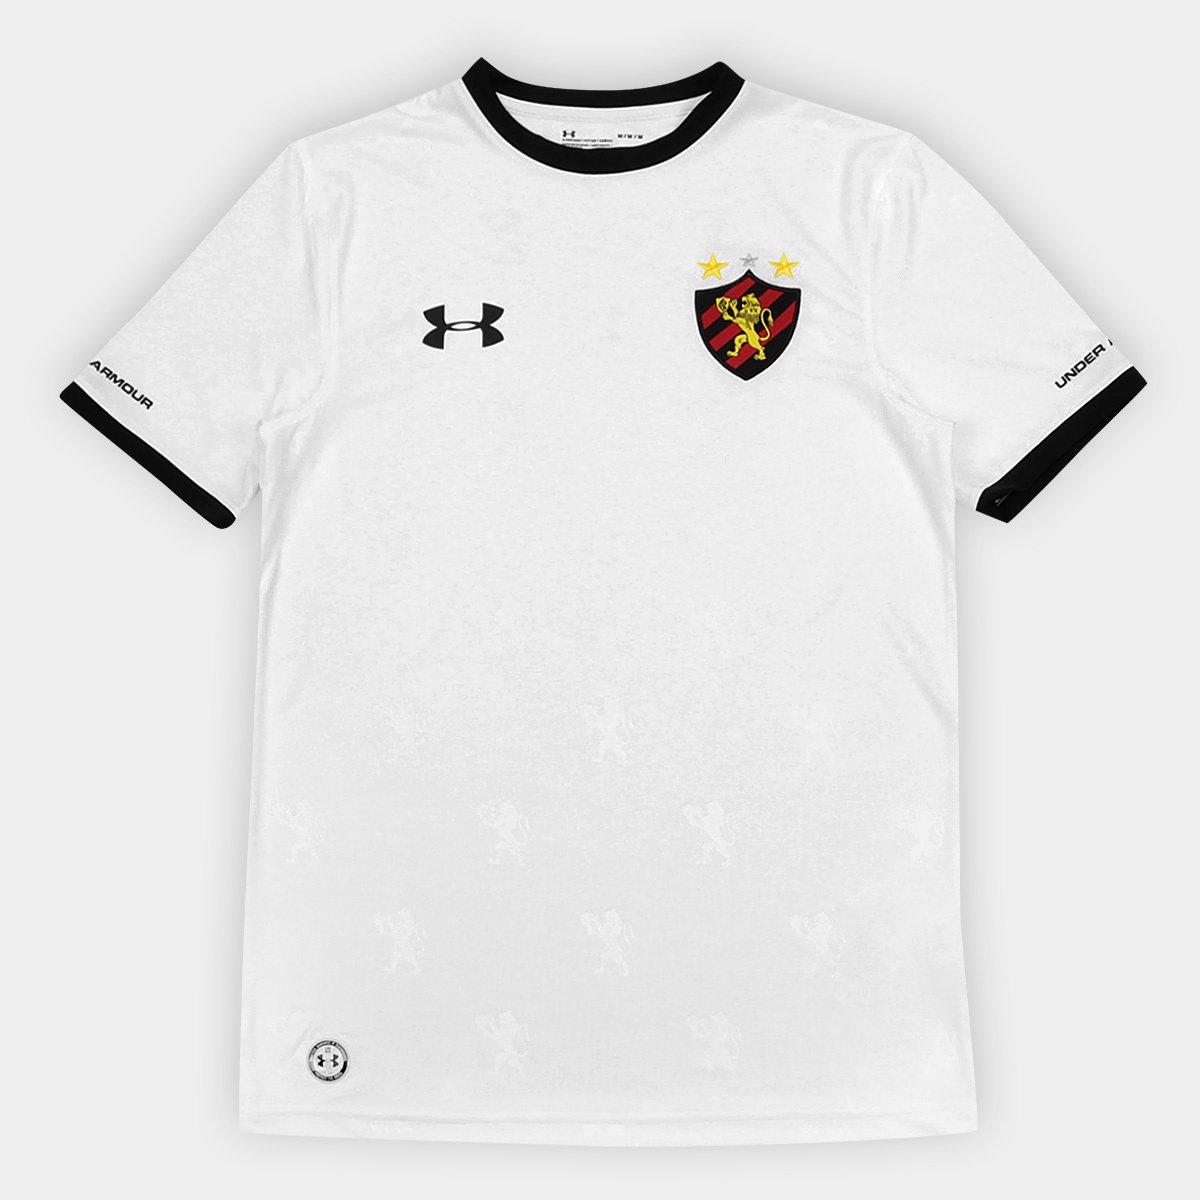 9923a86cdf ... Camisa Sport Recife II 2018 Nº 30 Gabriel - Torcedor Under Armour  Masculina ...